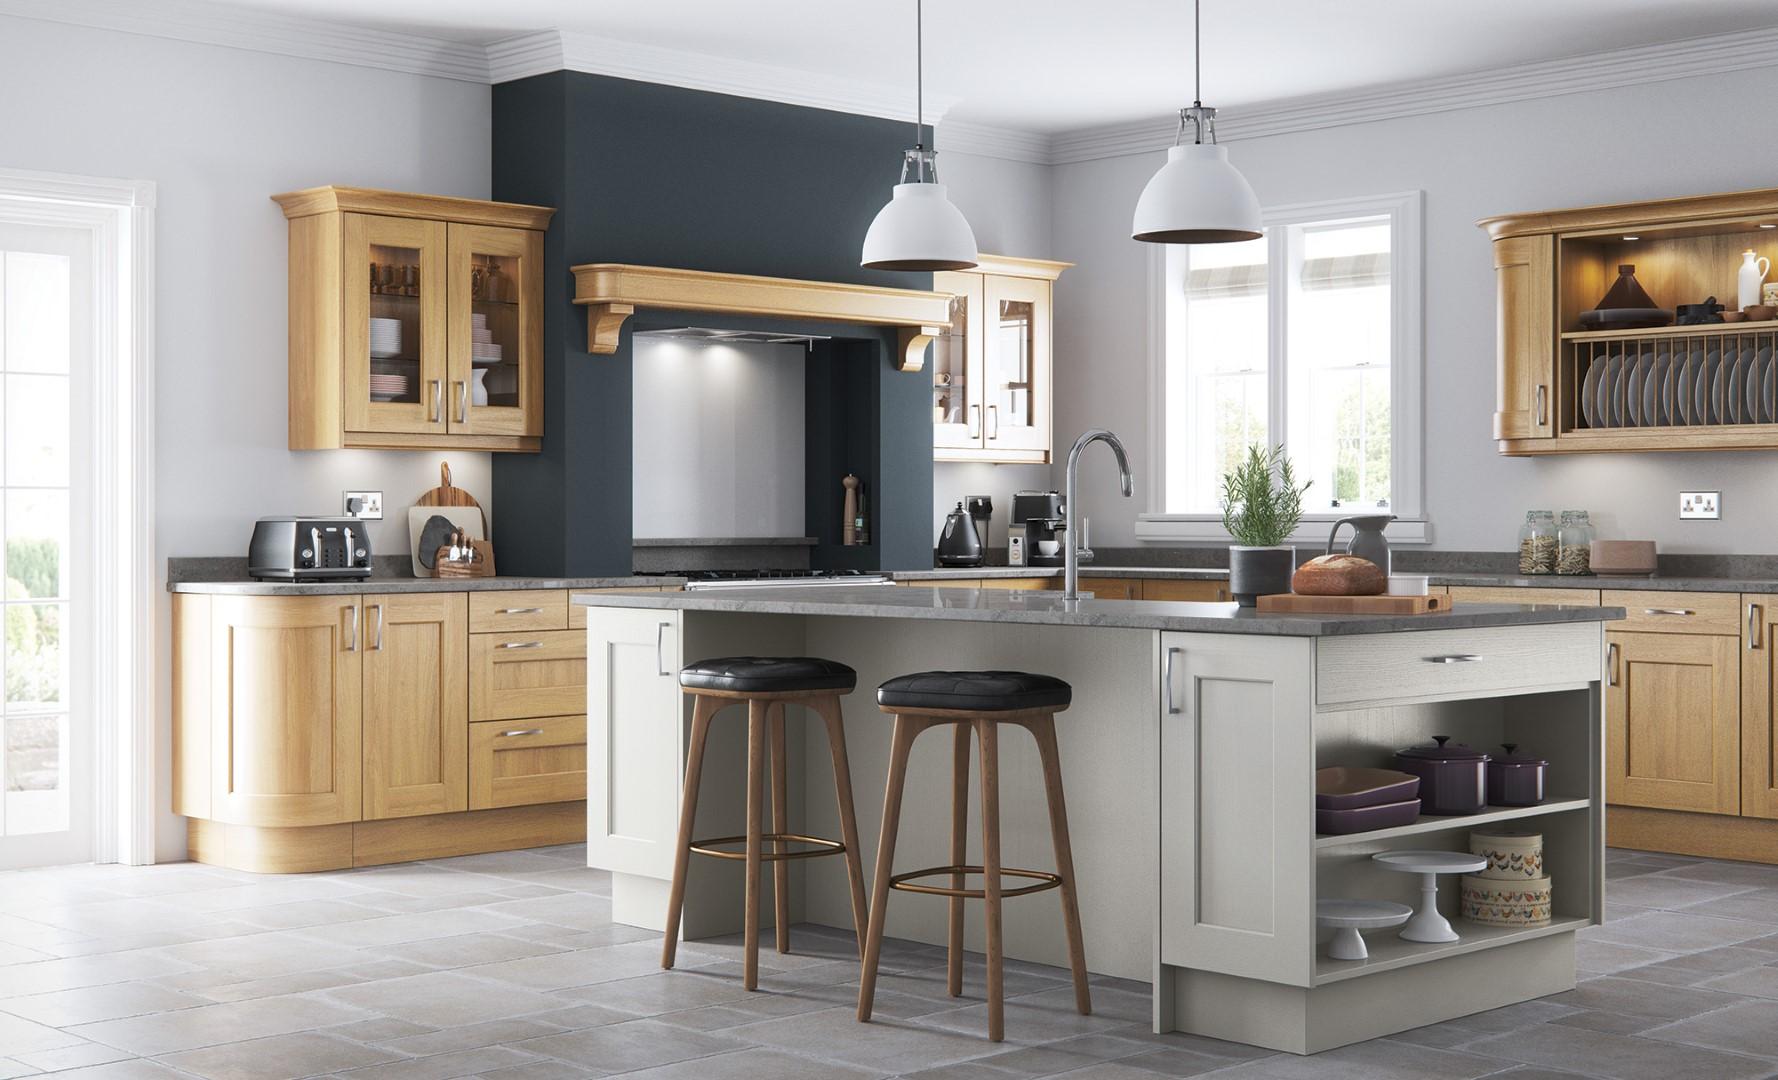 Wakefield Light Oak Painted Stone Kitchen - Kitchen Design - Alan Kelly Kitchens - Waterford